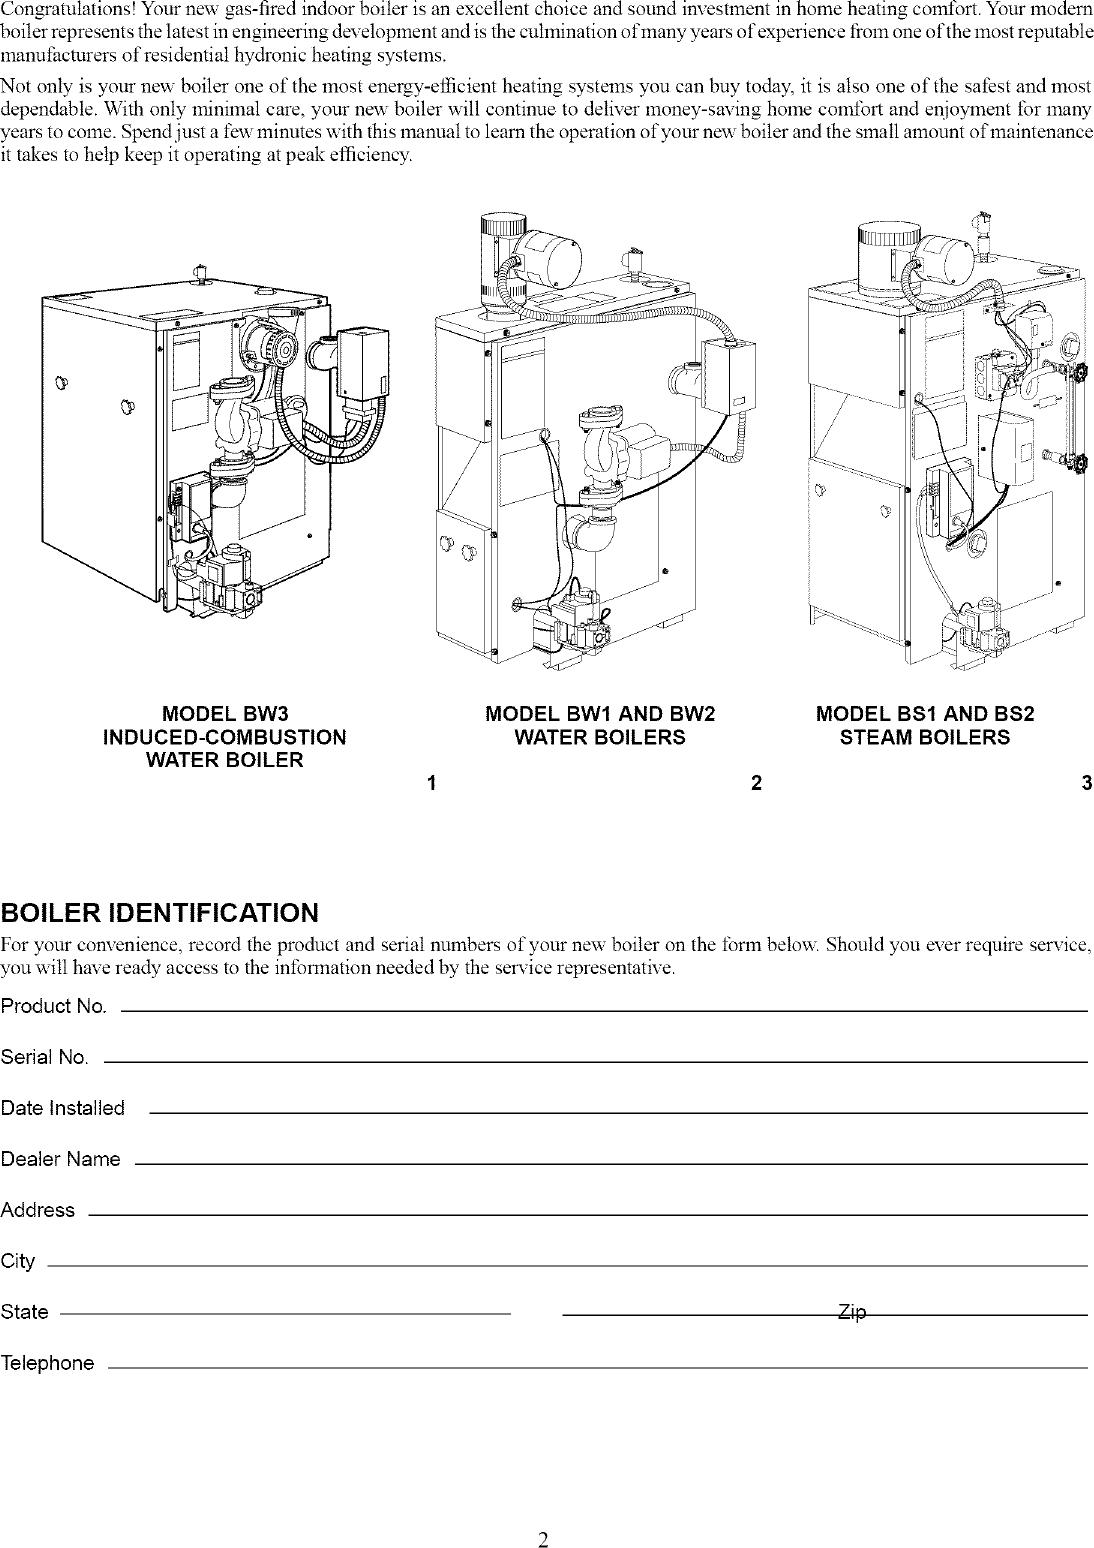 CARRIER Boiler Manual L0408302